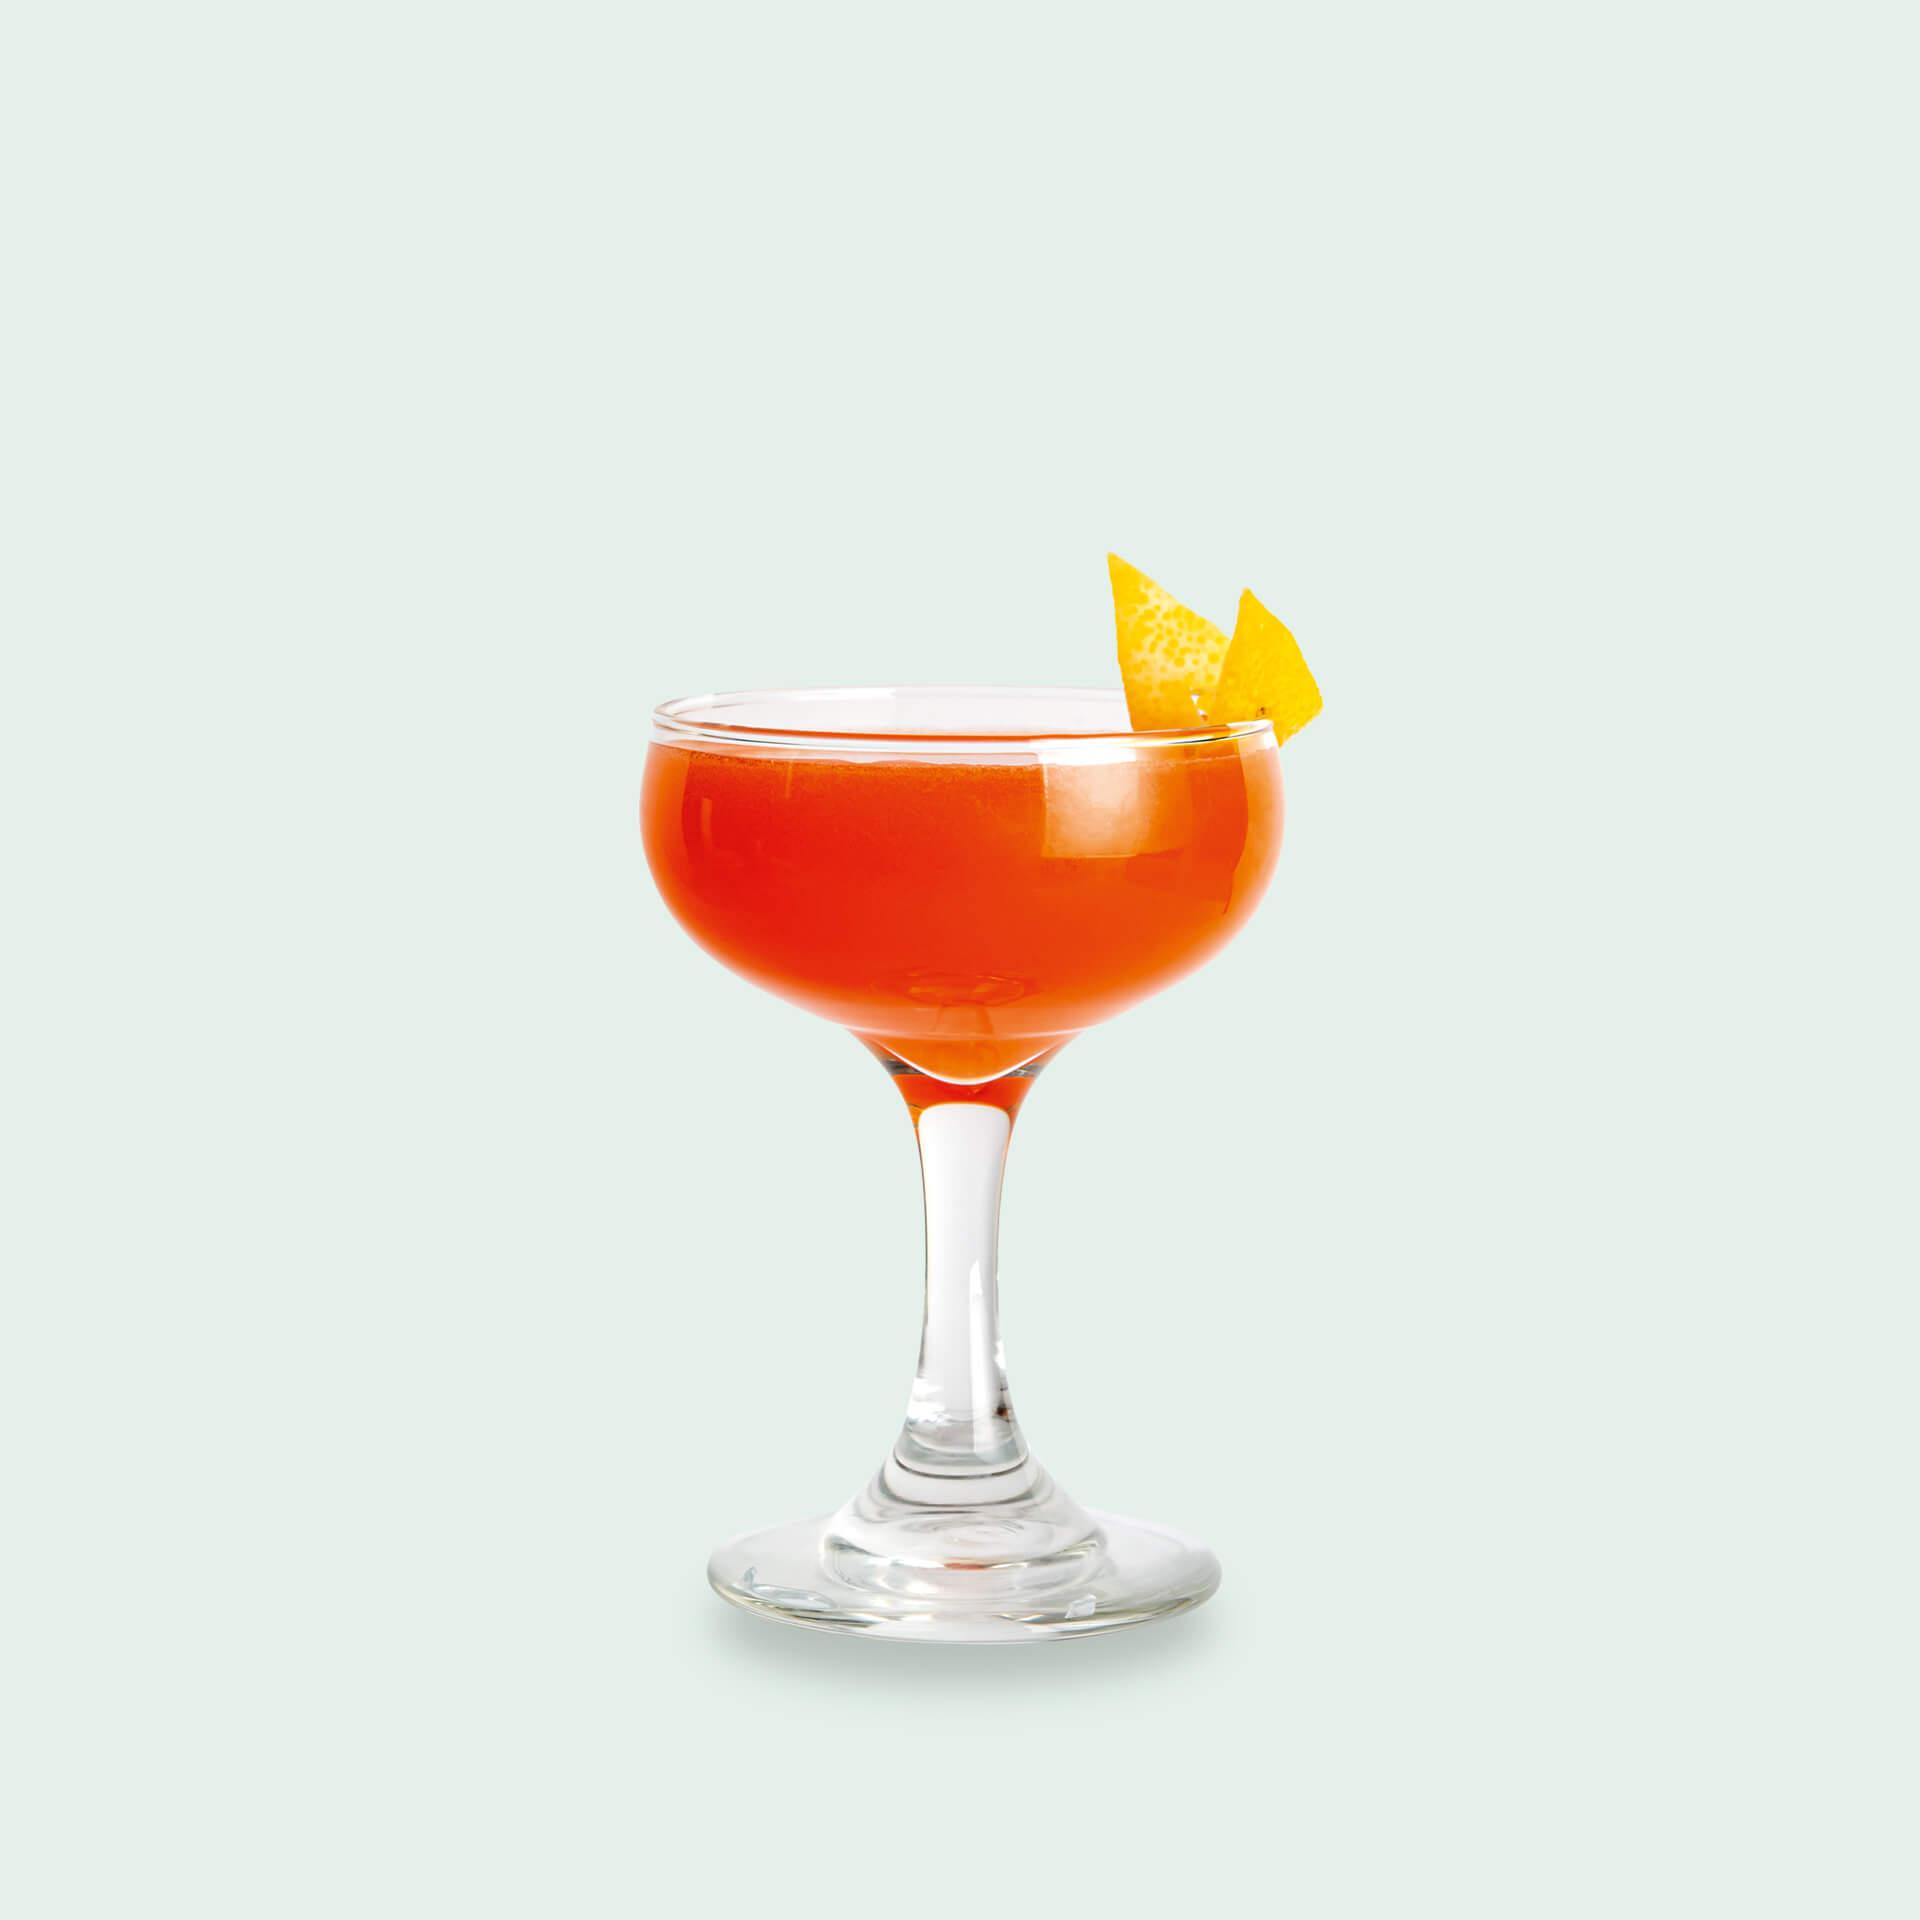 Besondere Baijiu Cocktails im Drink Syndikat Set mit Ming River Baijiu: Paper Crane